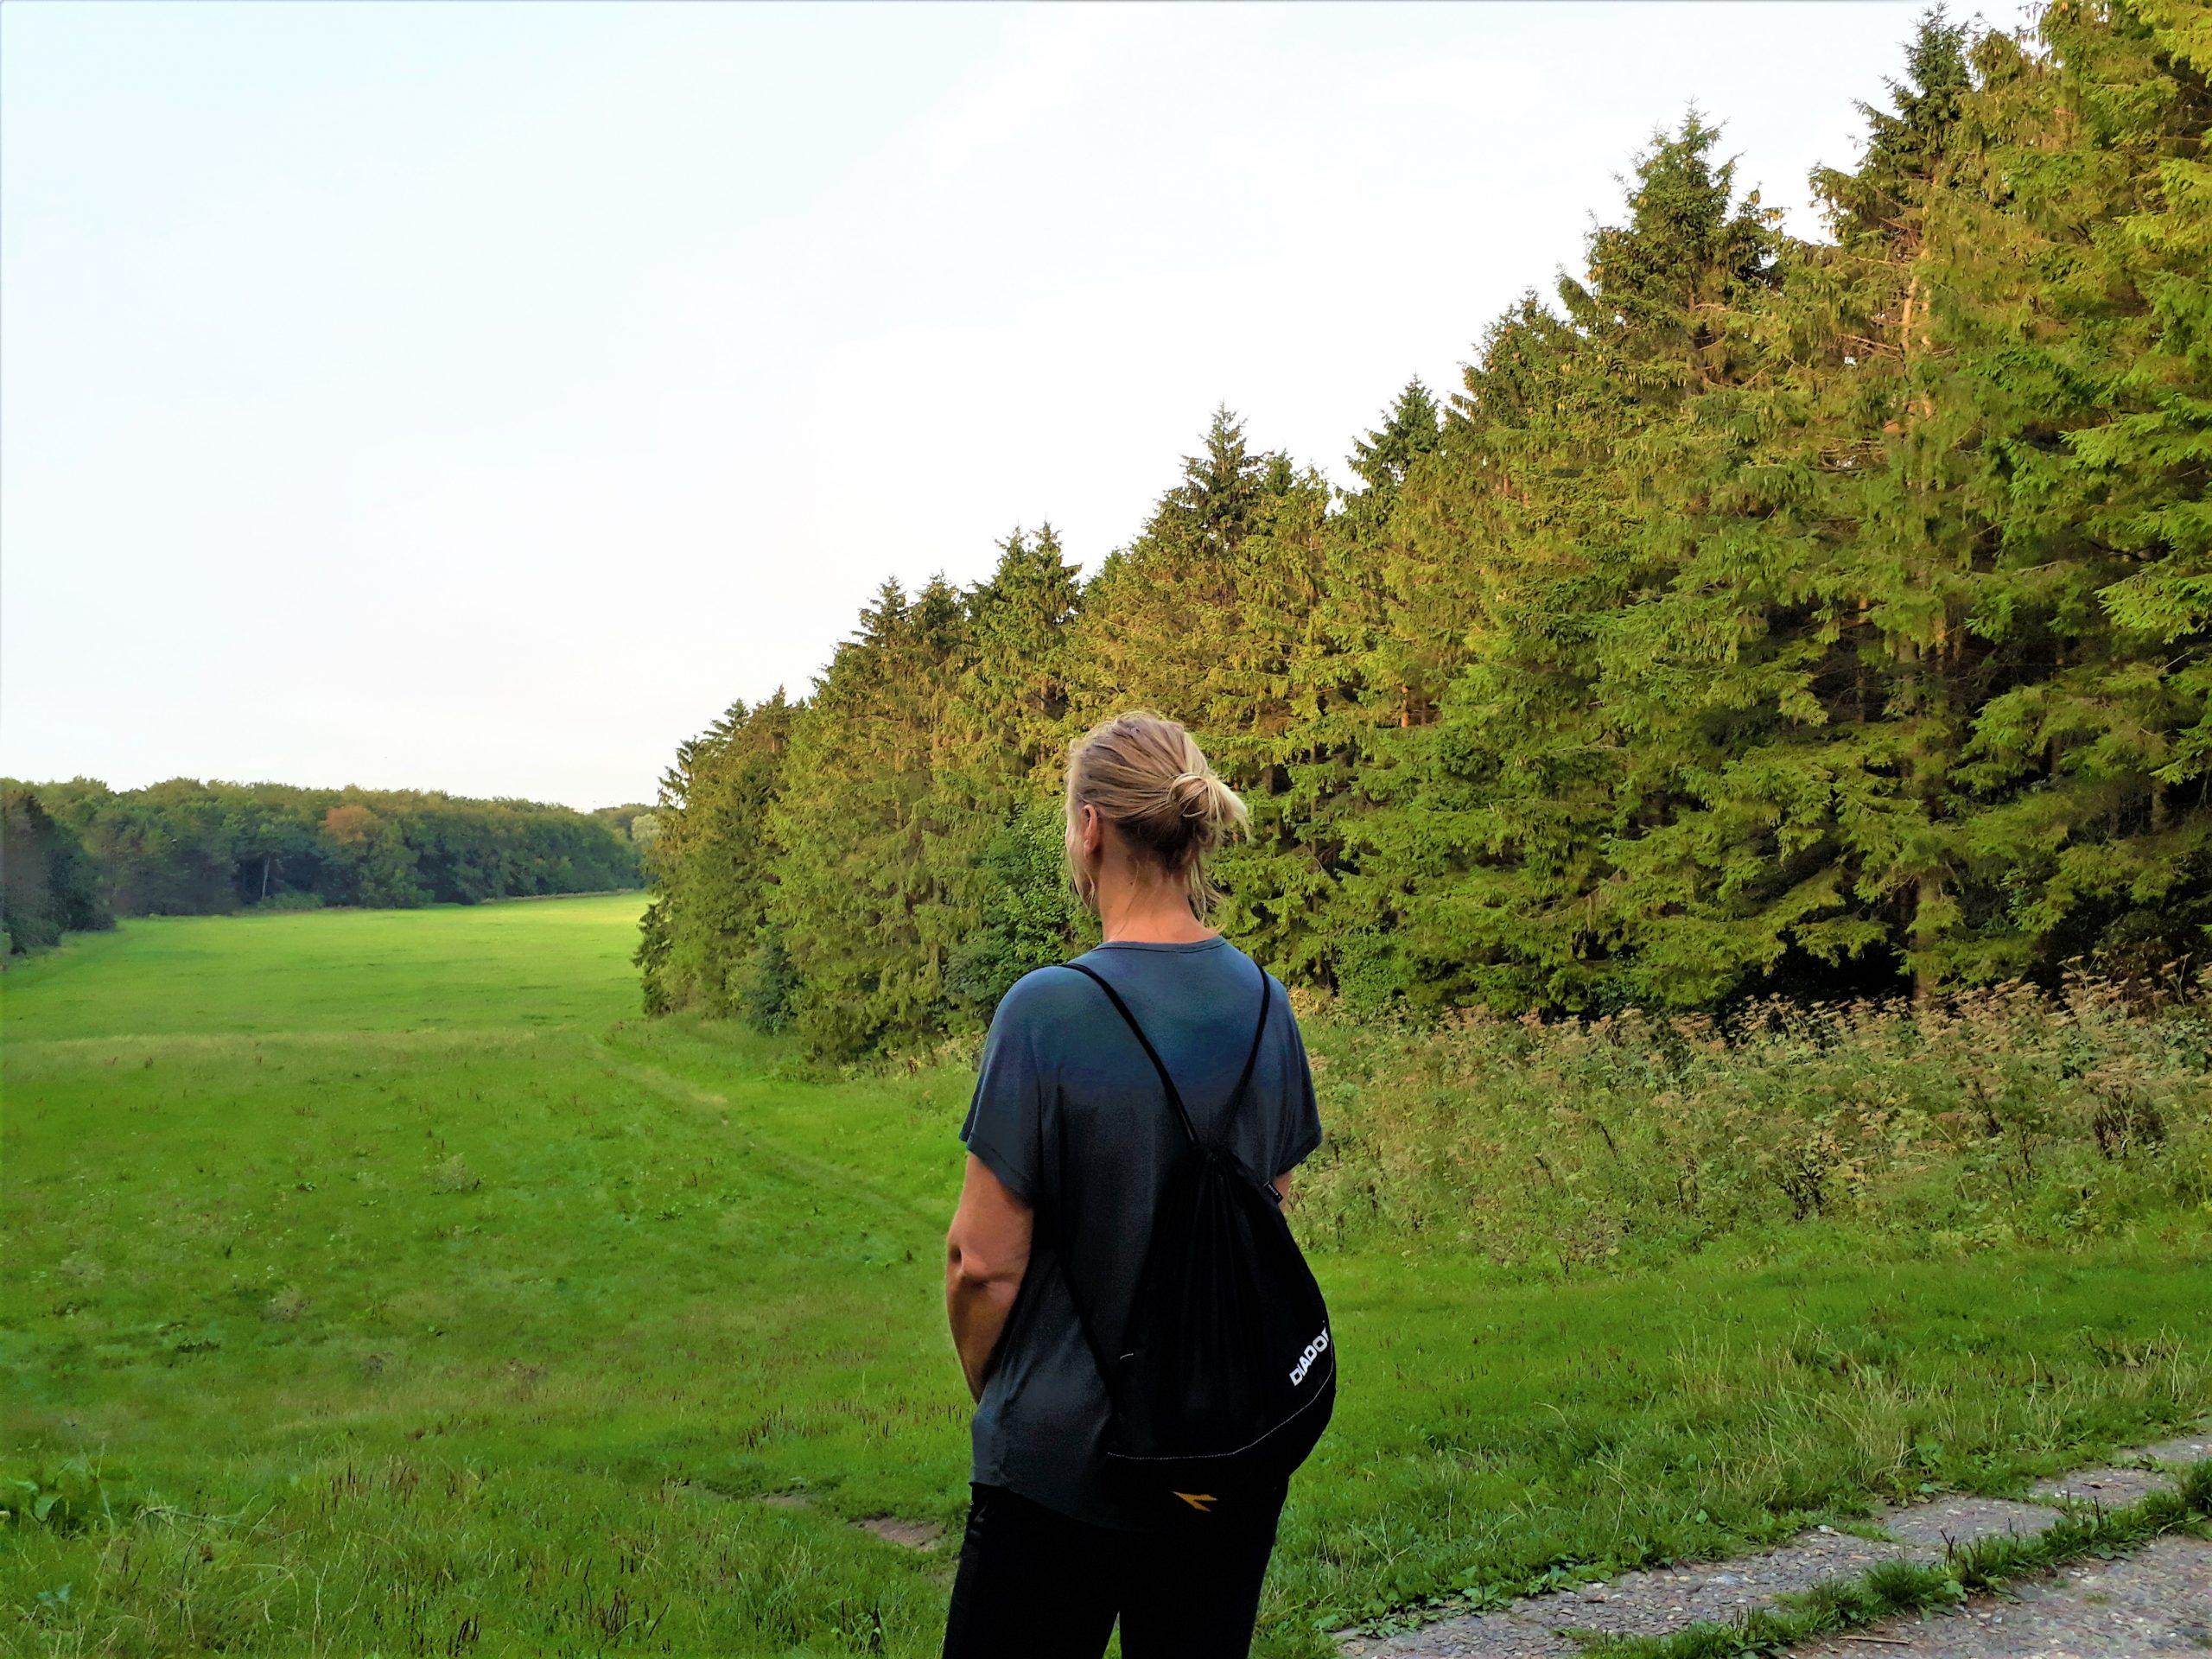 MindWalker, Stil staan tijdens individuele wandelcoaching. MindWalker